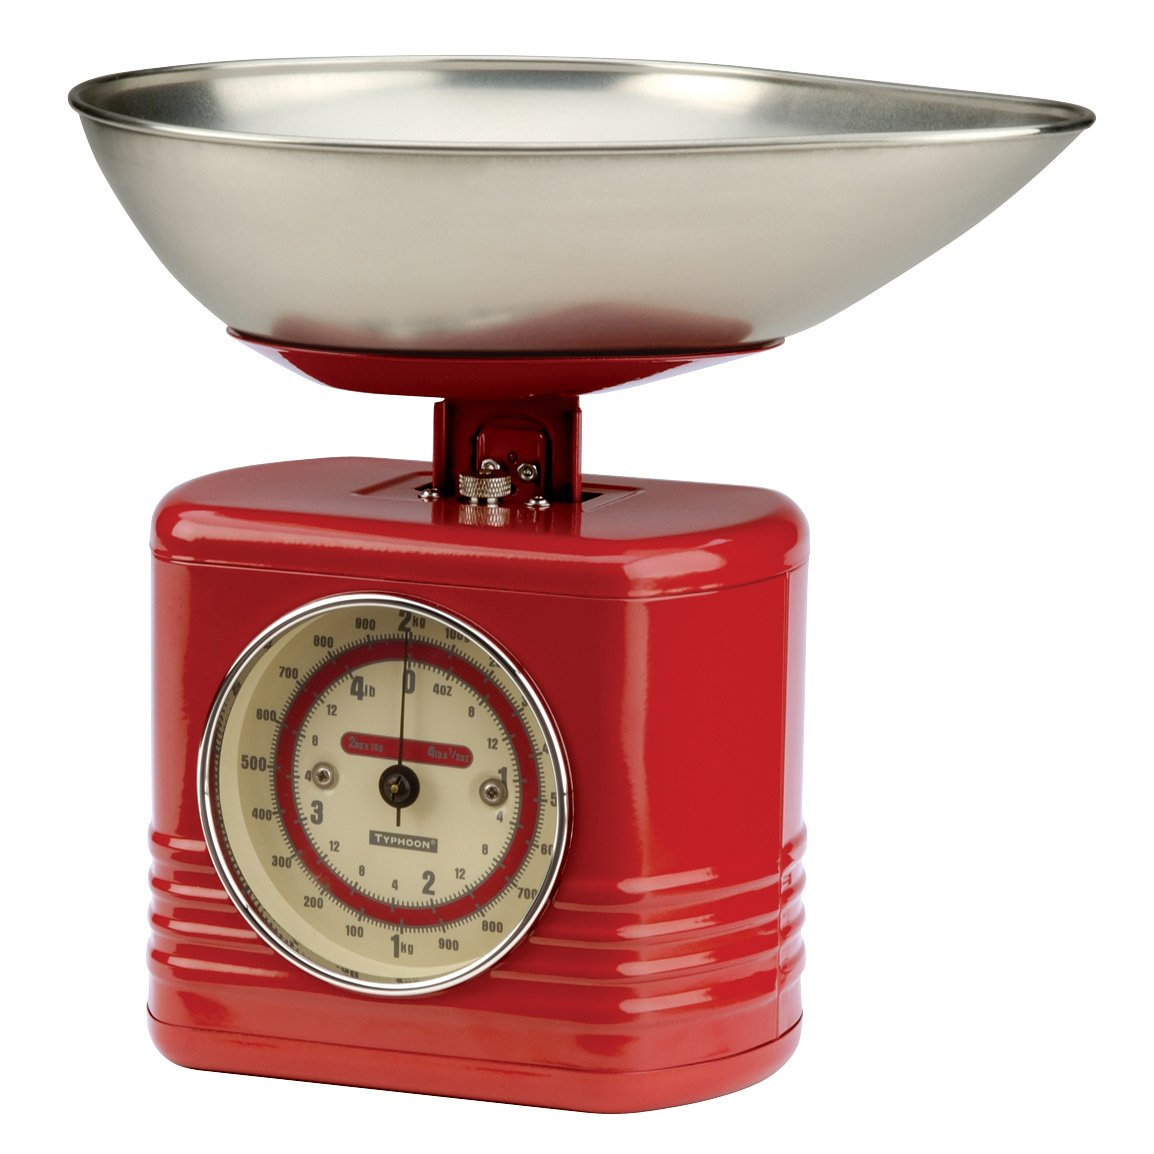 Typhoon Vintage Kitchen Red Scales